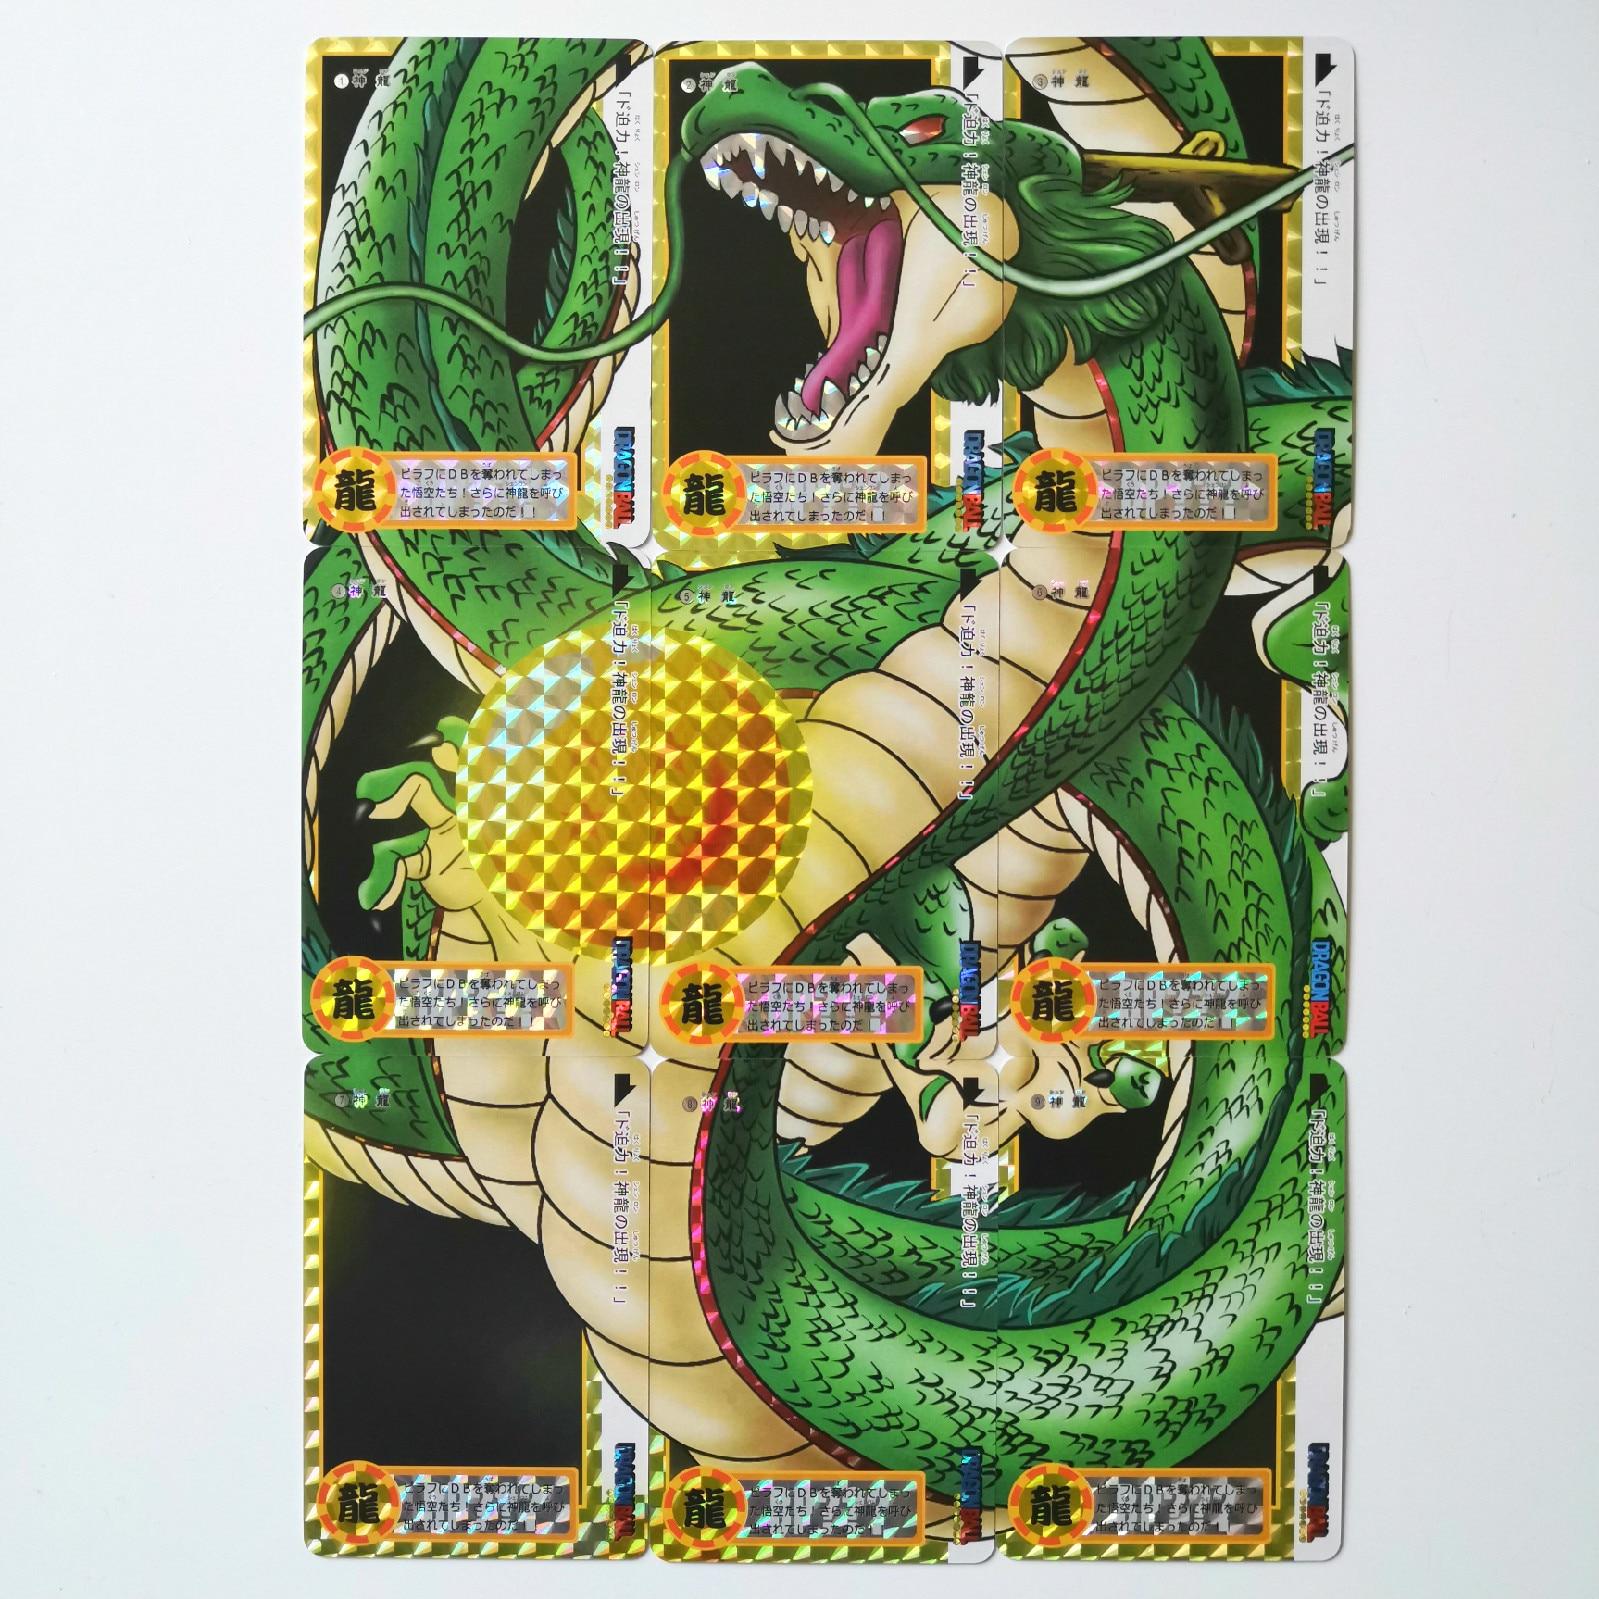 9pcs/set Shenron 9 In 1 Super Dragon Ball Z Heroes Battle Card Ultra Instinct Goku Vegeta Game Collection Cards